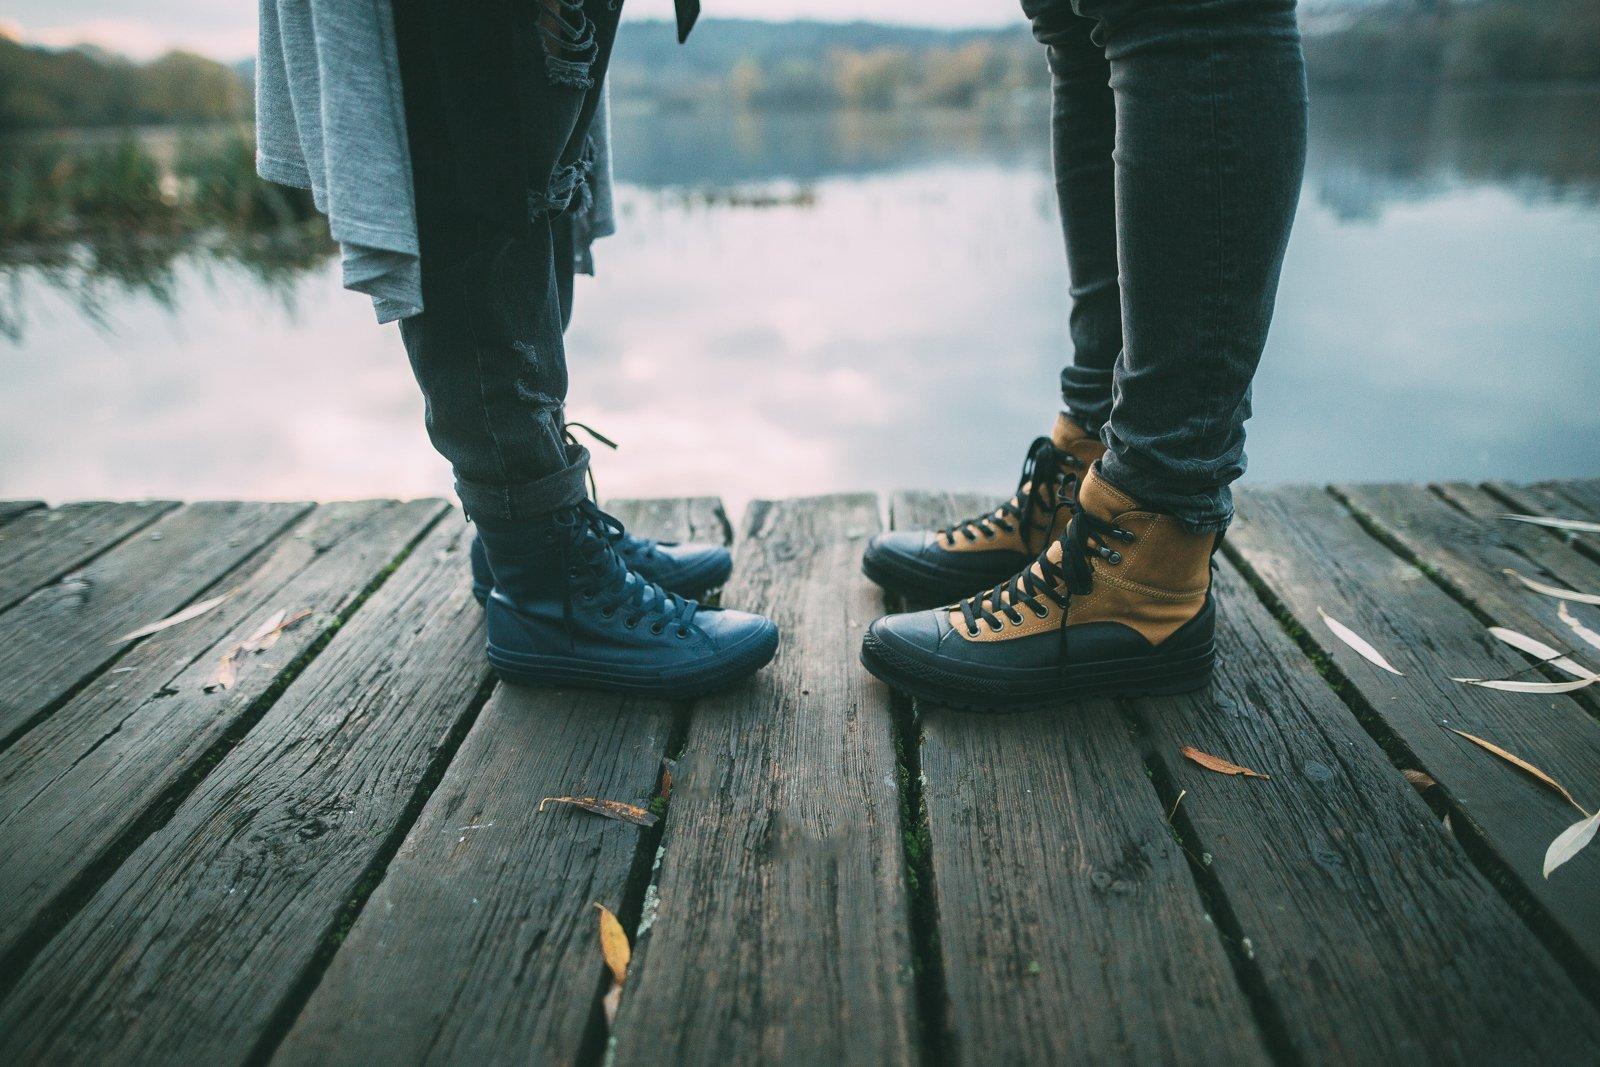 chucks f r den winter die converse sneaker boots kollektion. Black Bedroom Furniture Sets. Home Design Ideas